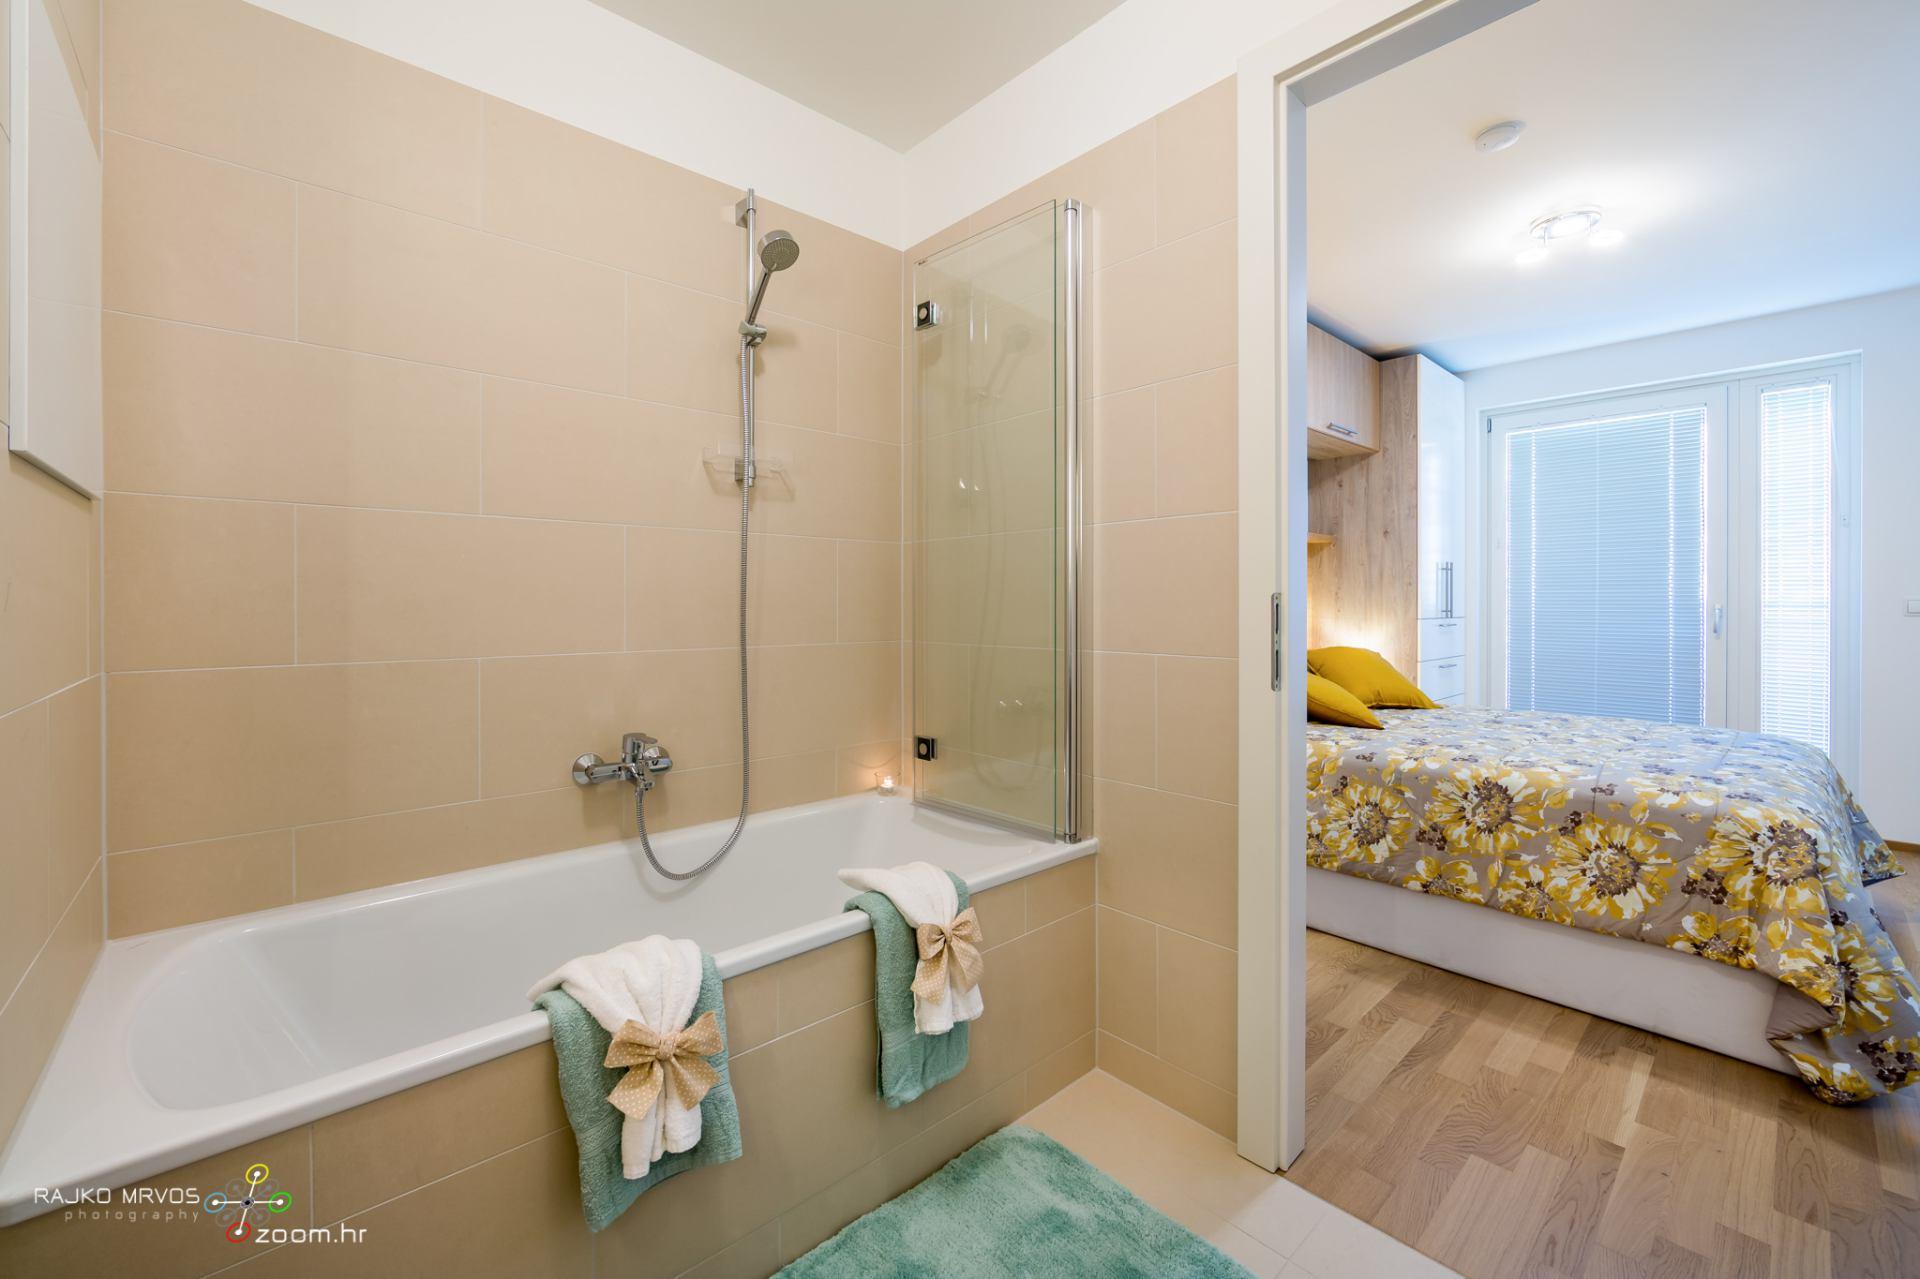 fotografiranje-interijera-fotograf-eksterijera-apartmana-vila-kuca-apartman-Beč-40